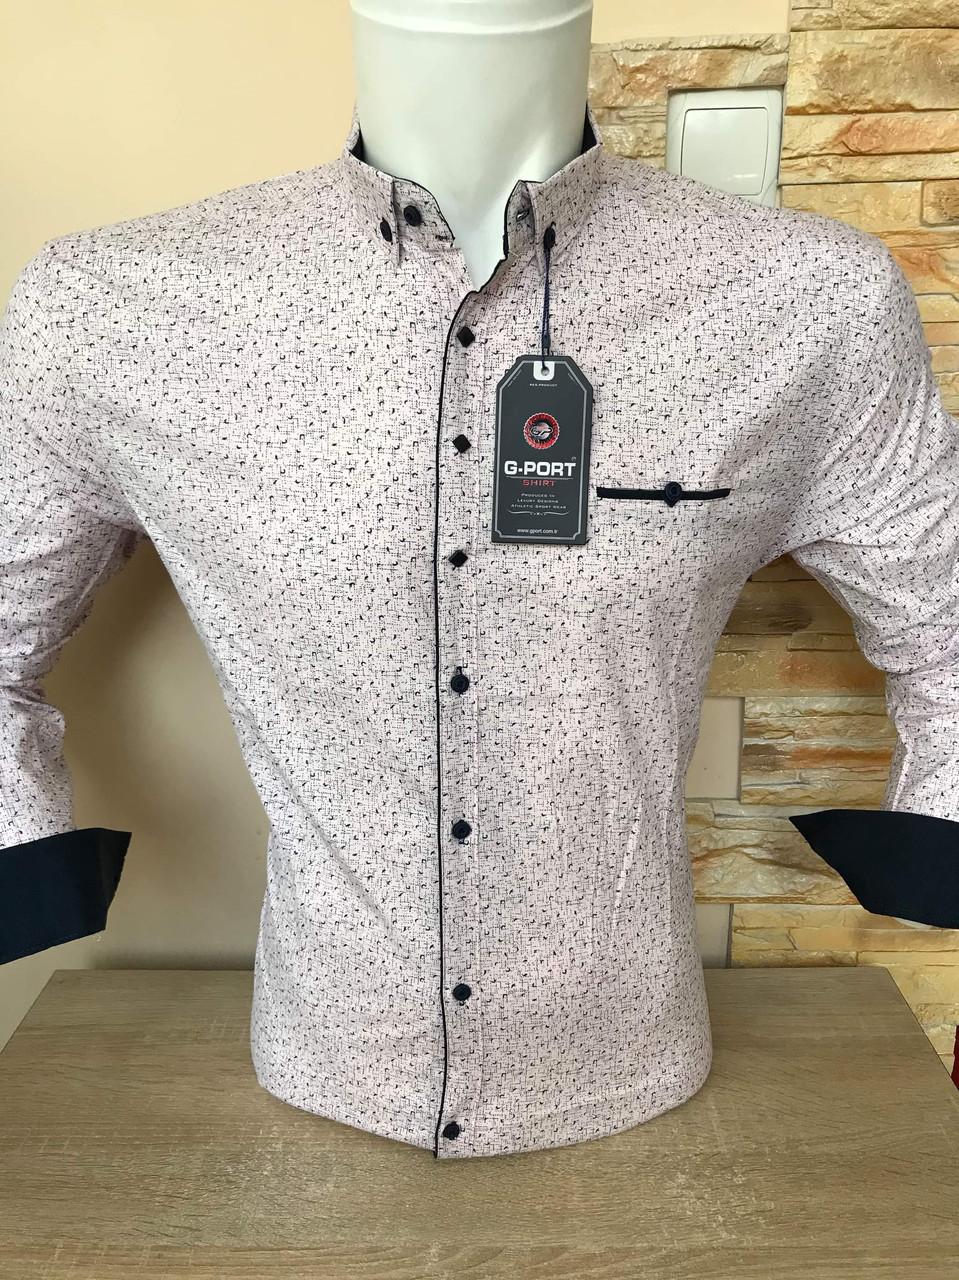 Батальна сорочка з довгим рукавом G-port з принтом - 890